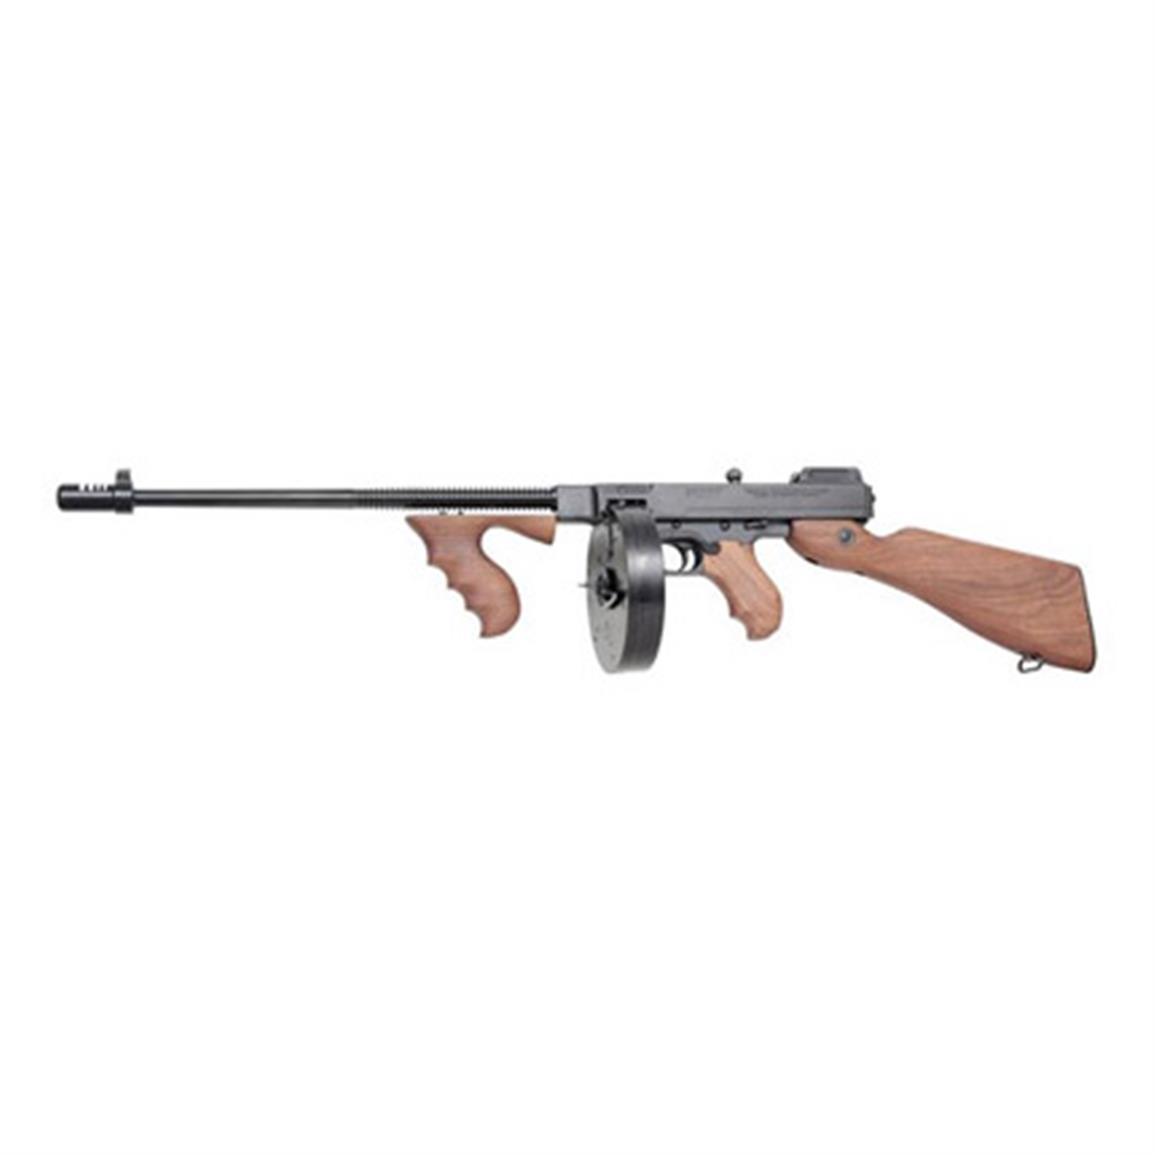 Auto-Ordnance Thompson, Semi-automatic,  45 ACP - $1463 94 + $4 99 S/H